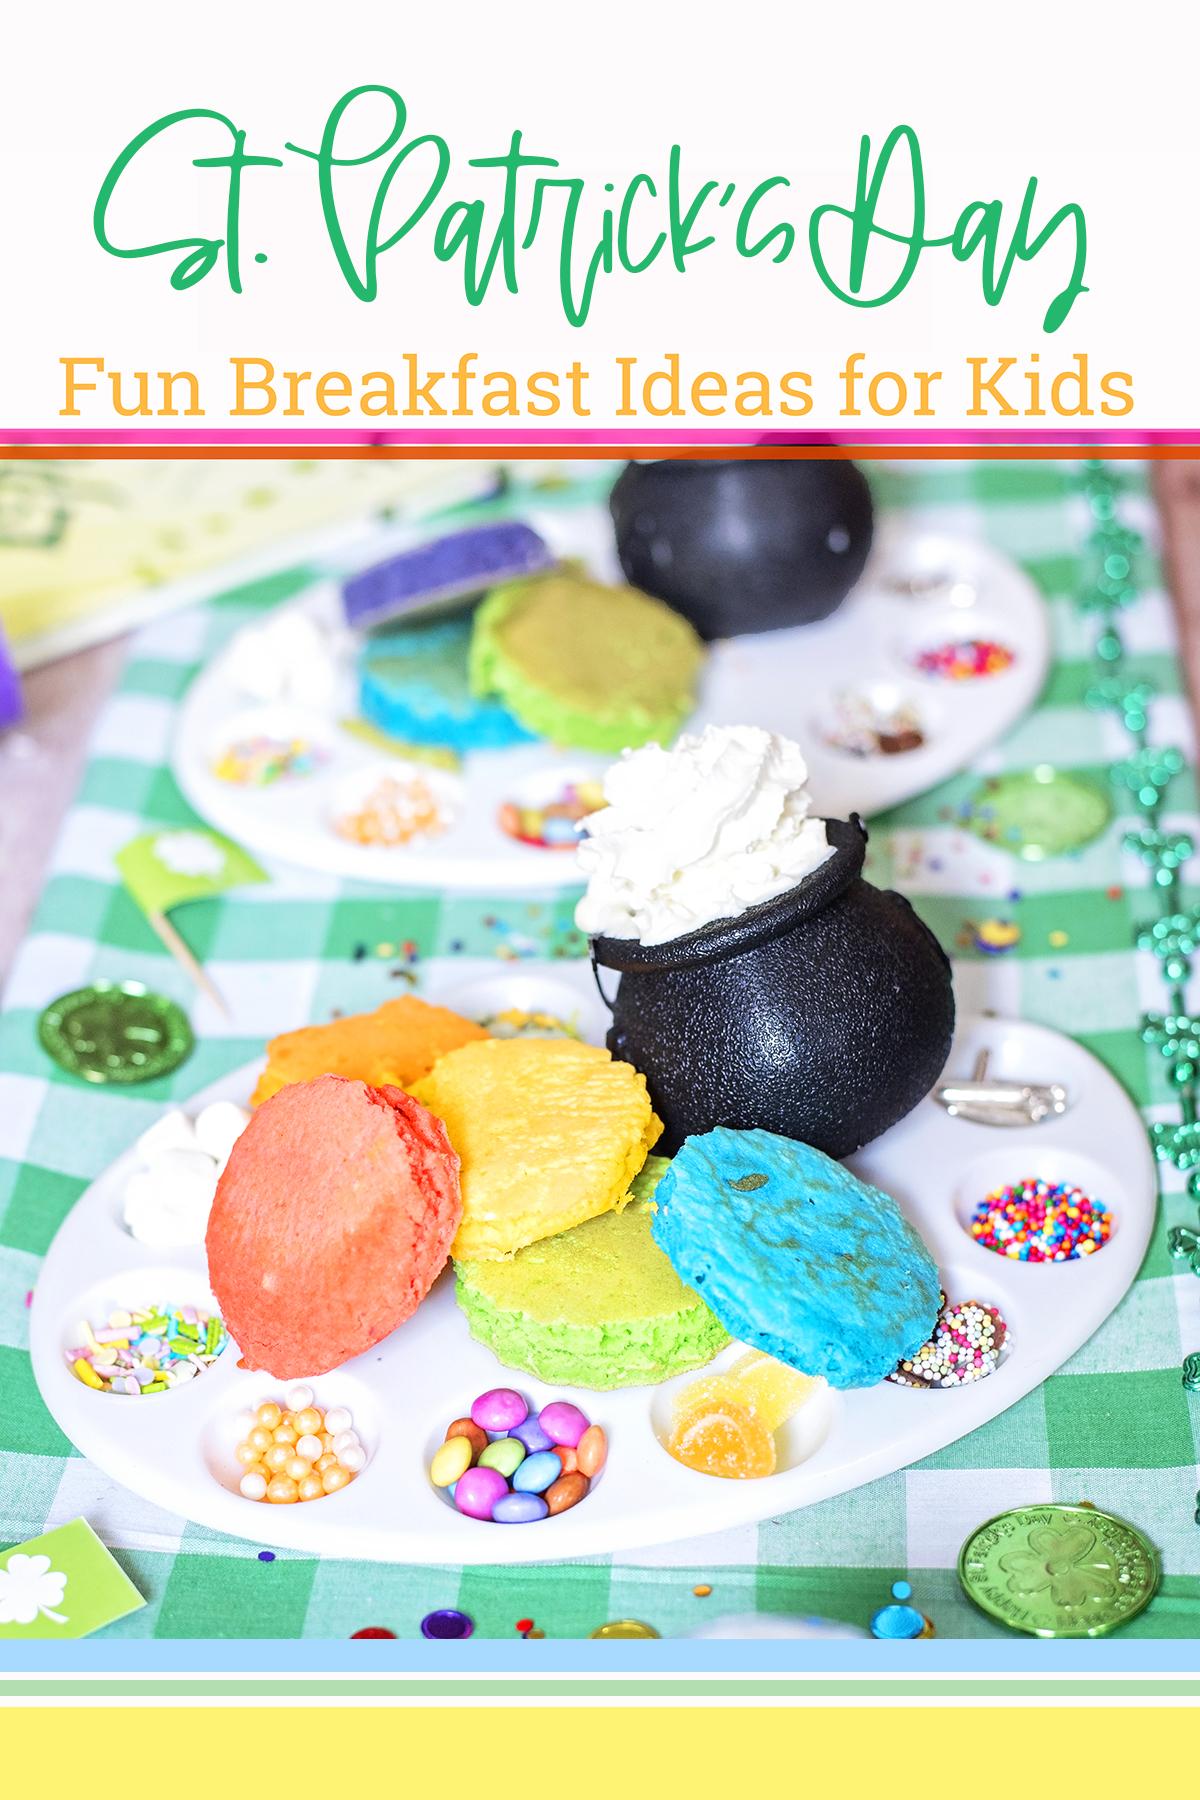 St. Patrick's Day Fun Breakfast Ideas for Kids